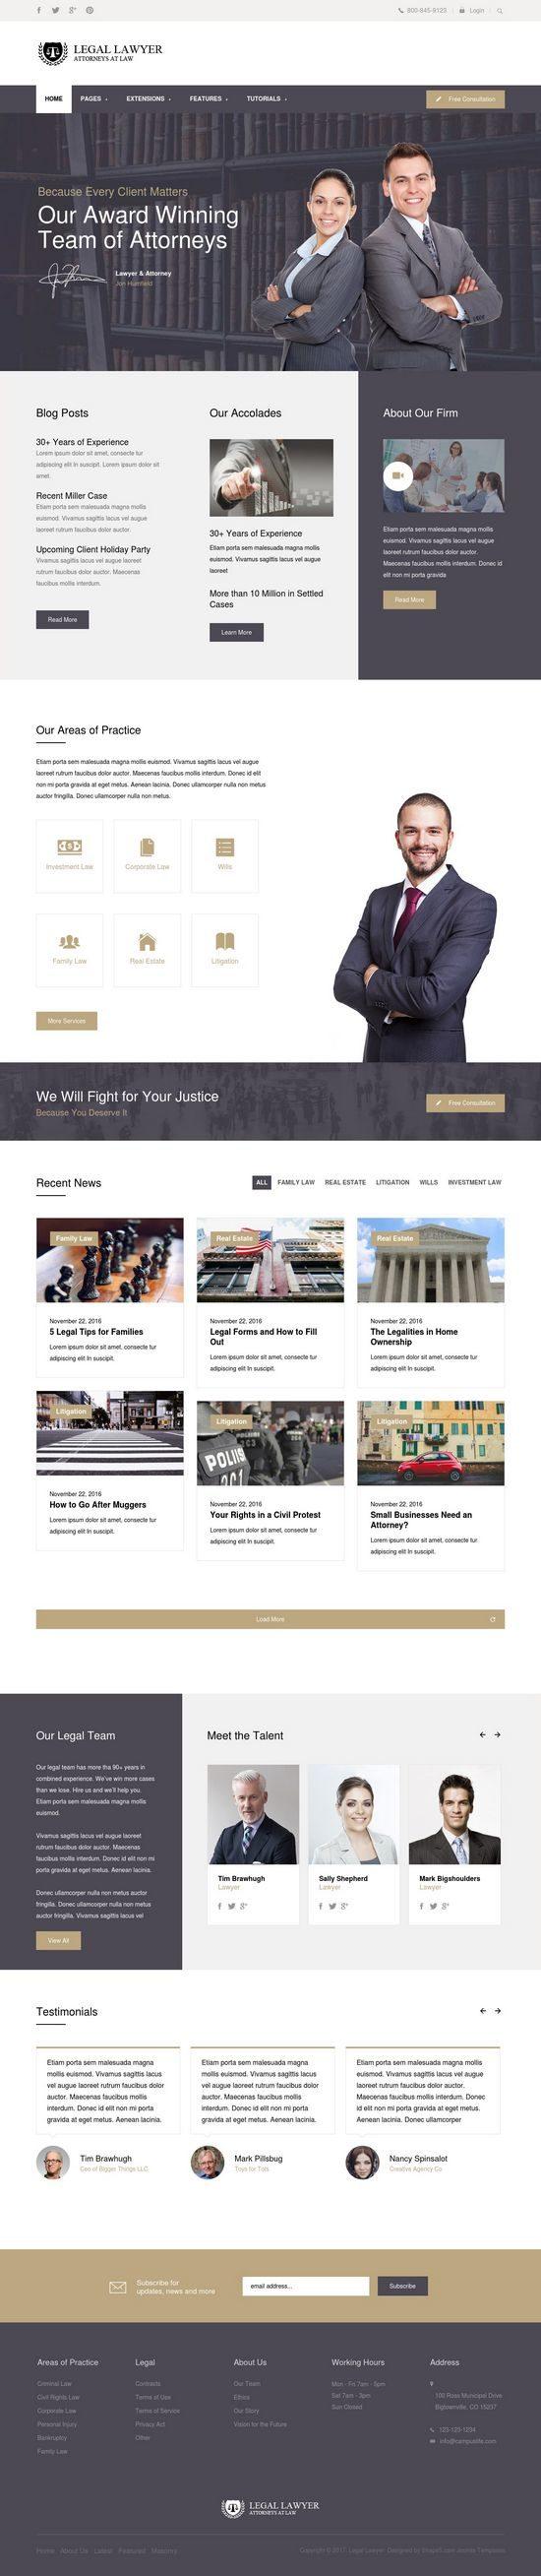 legal lawyer shape5 joomla templates 01 550x2617 - Legal Lawyer Joomla Template